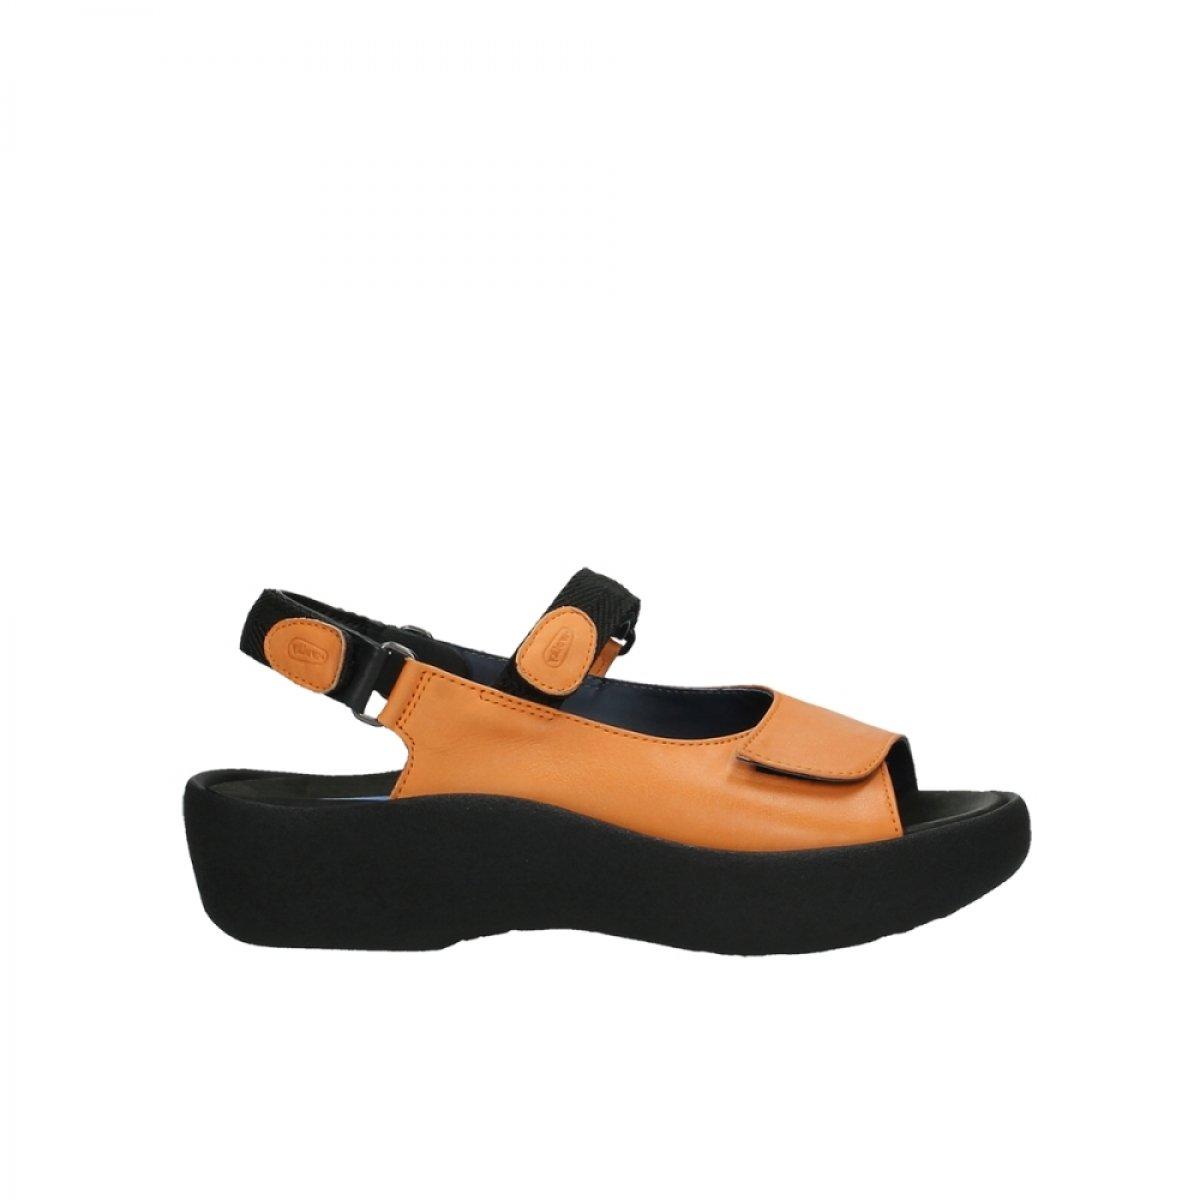 Wolky Womens 3204 Jewel Leather Sandals 44 EU|20550 Orange Leder